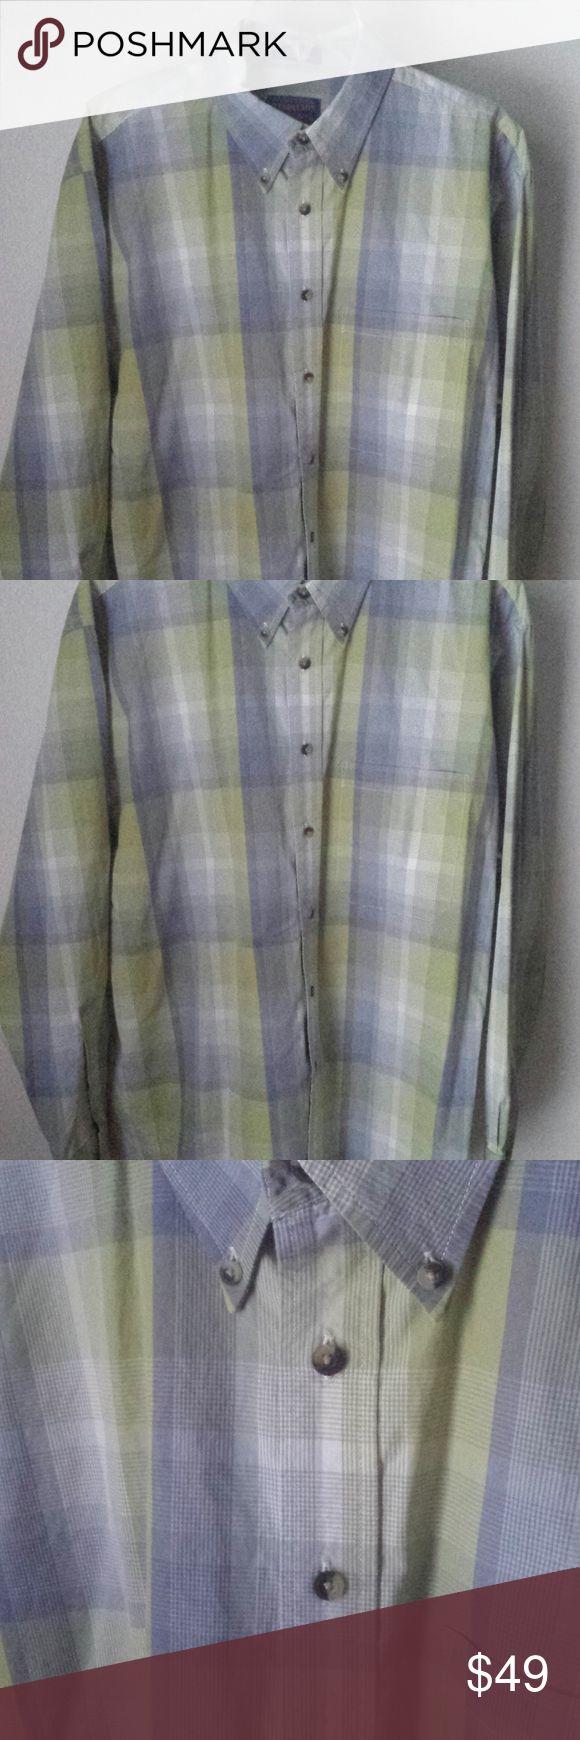 Pendleton Woolen Mills Button Down Shirt Pendleton Woolen Mills  100% Cotton  Blue Green  Button Down Shirt  Size Large Pendleton Shirts Dress Shirts